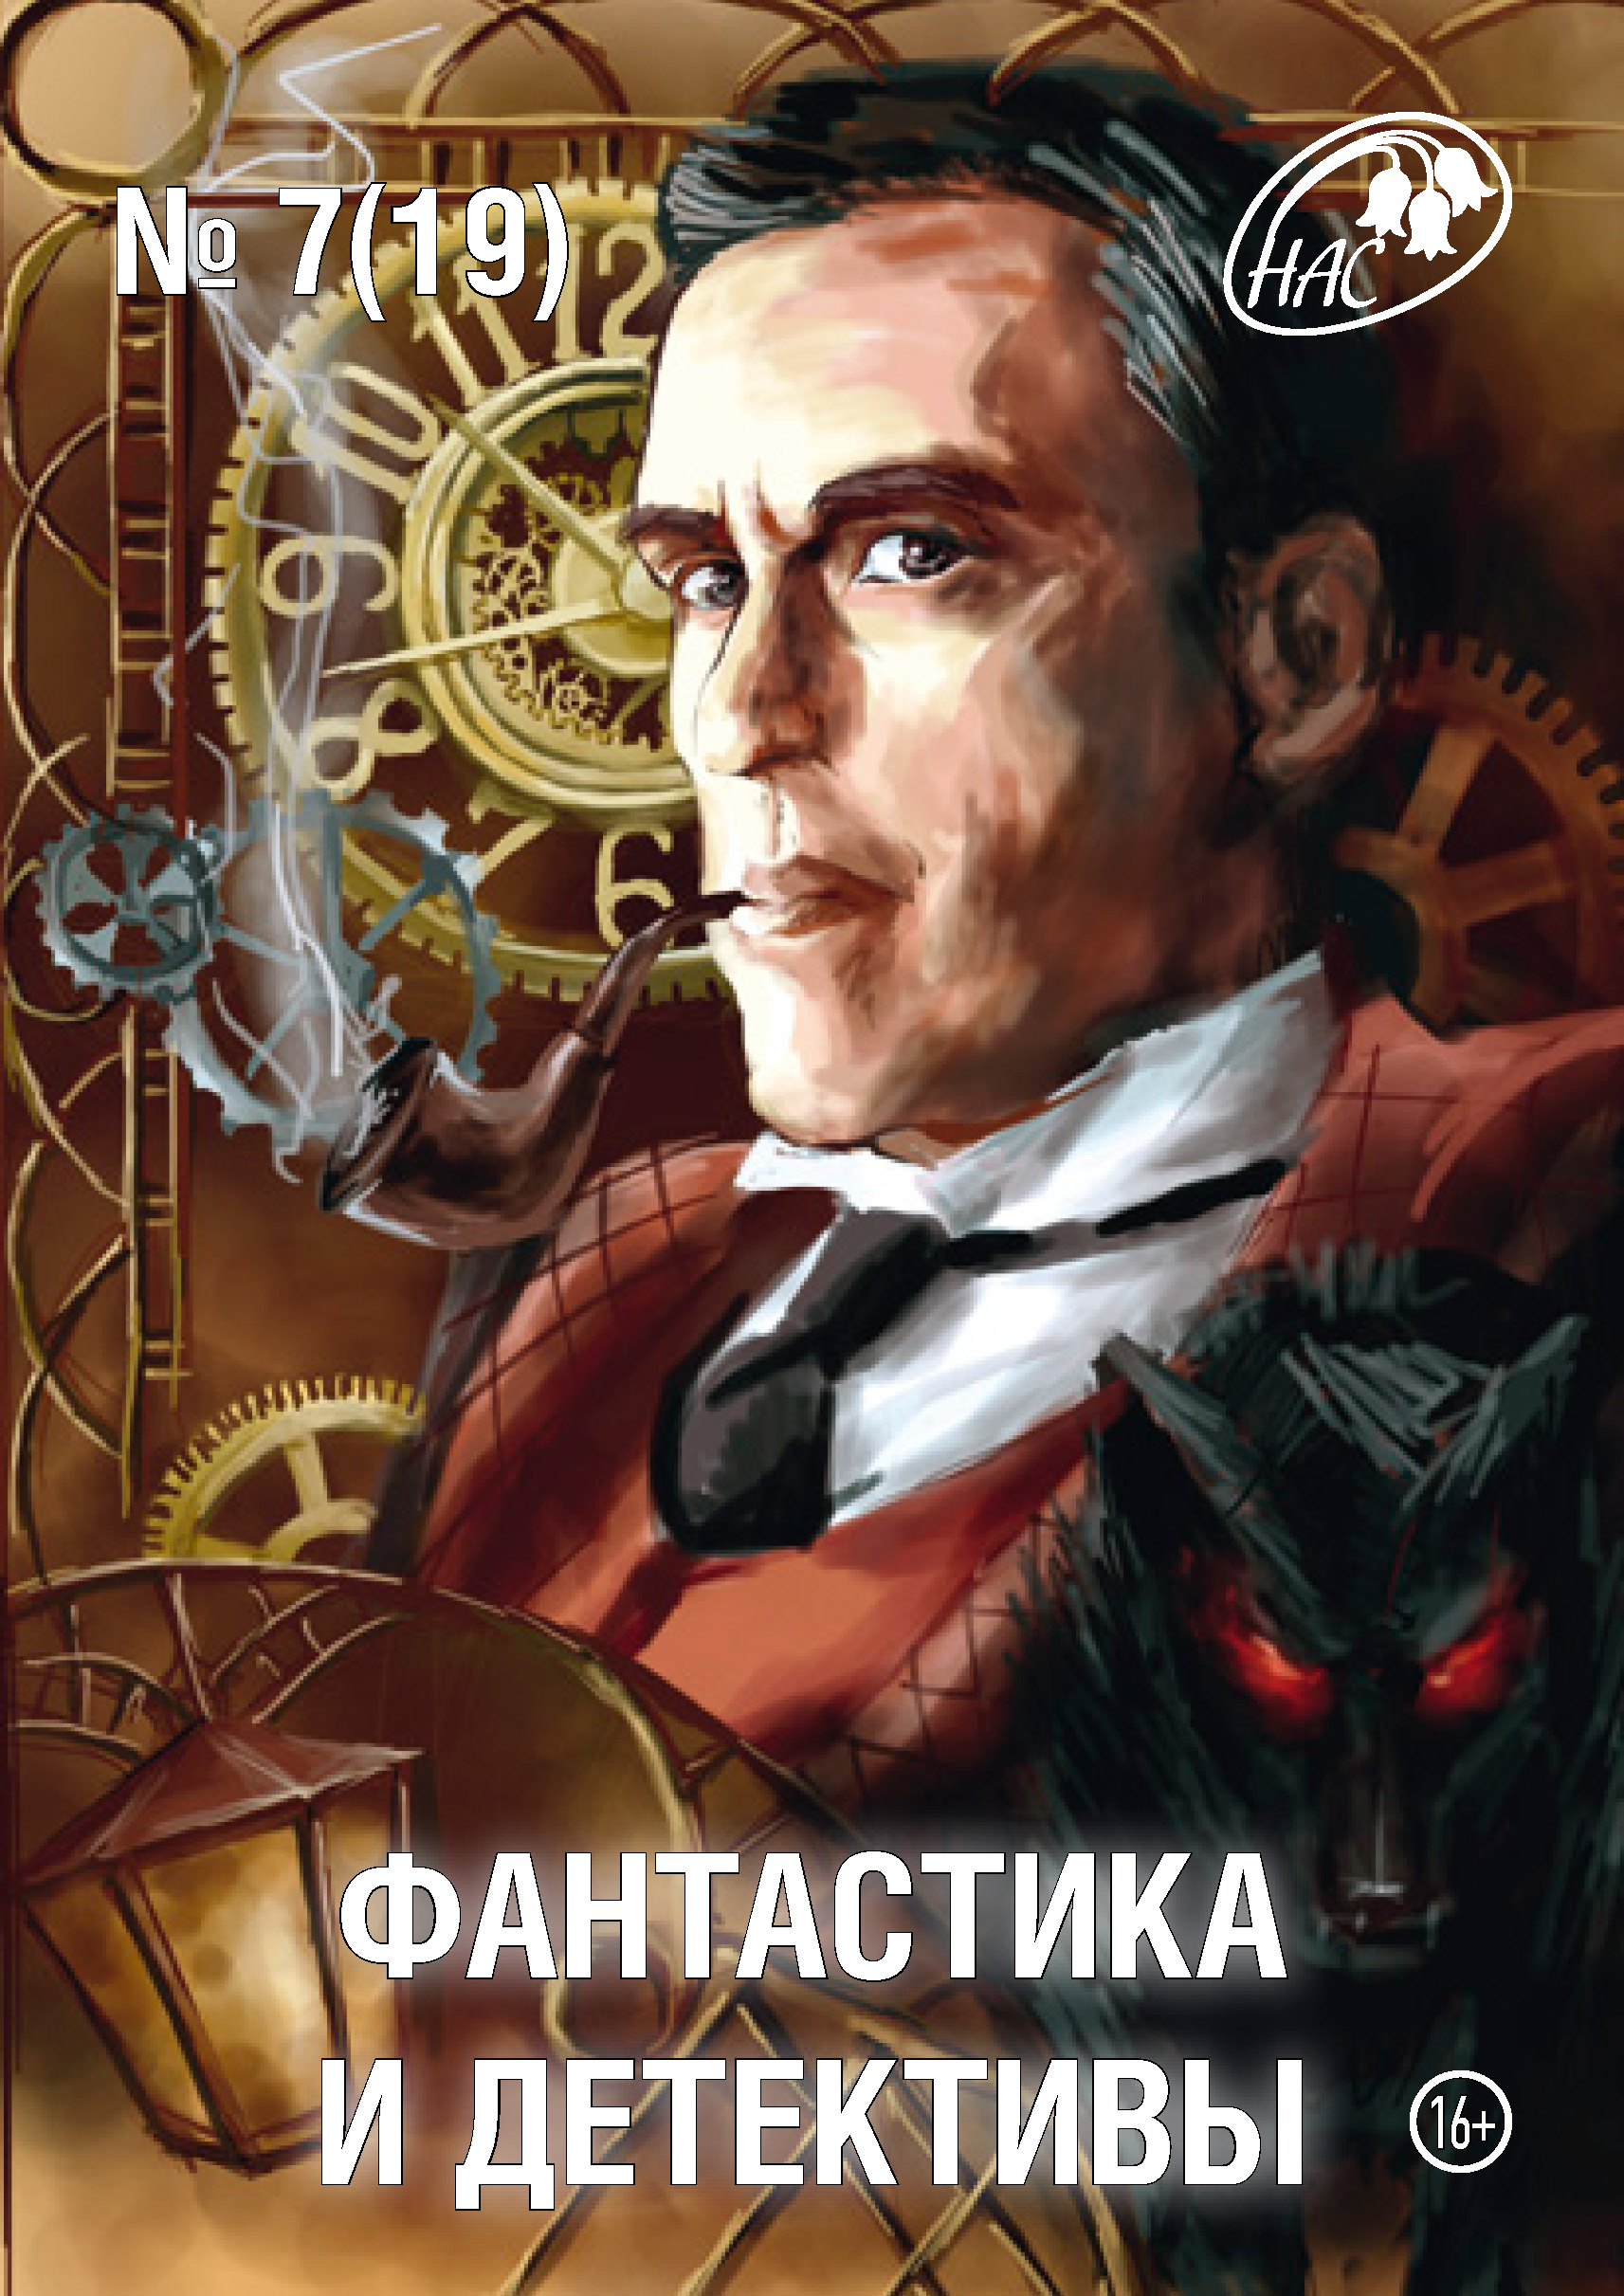 Сборник Журнал «Фантастика и Детективы» №7 (19) 2014 сборник журнал фантастика и детективы 6 18 2014